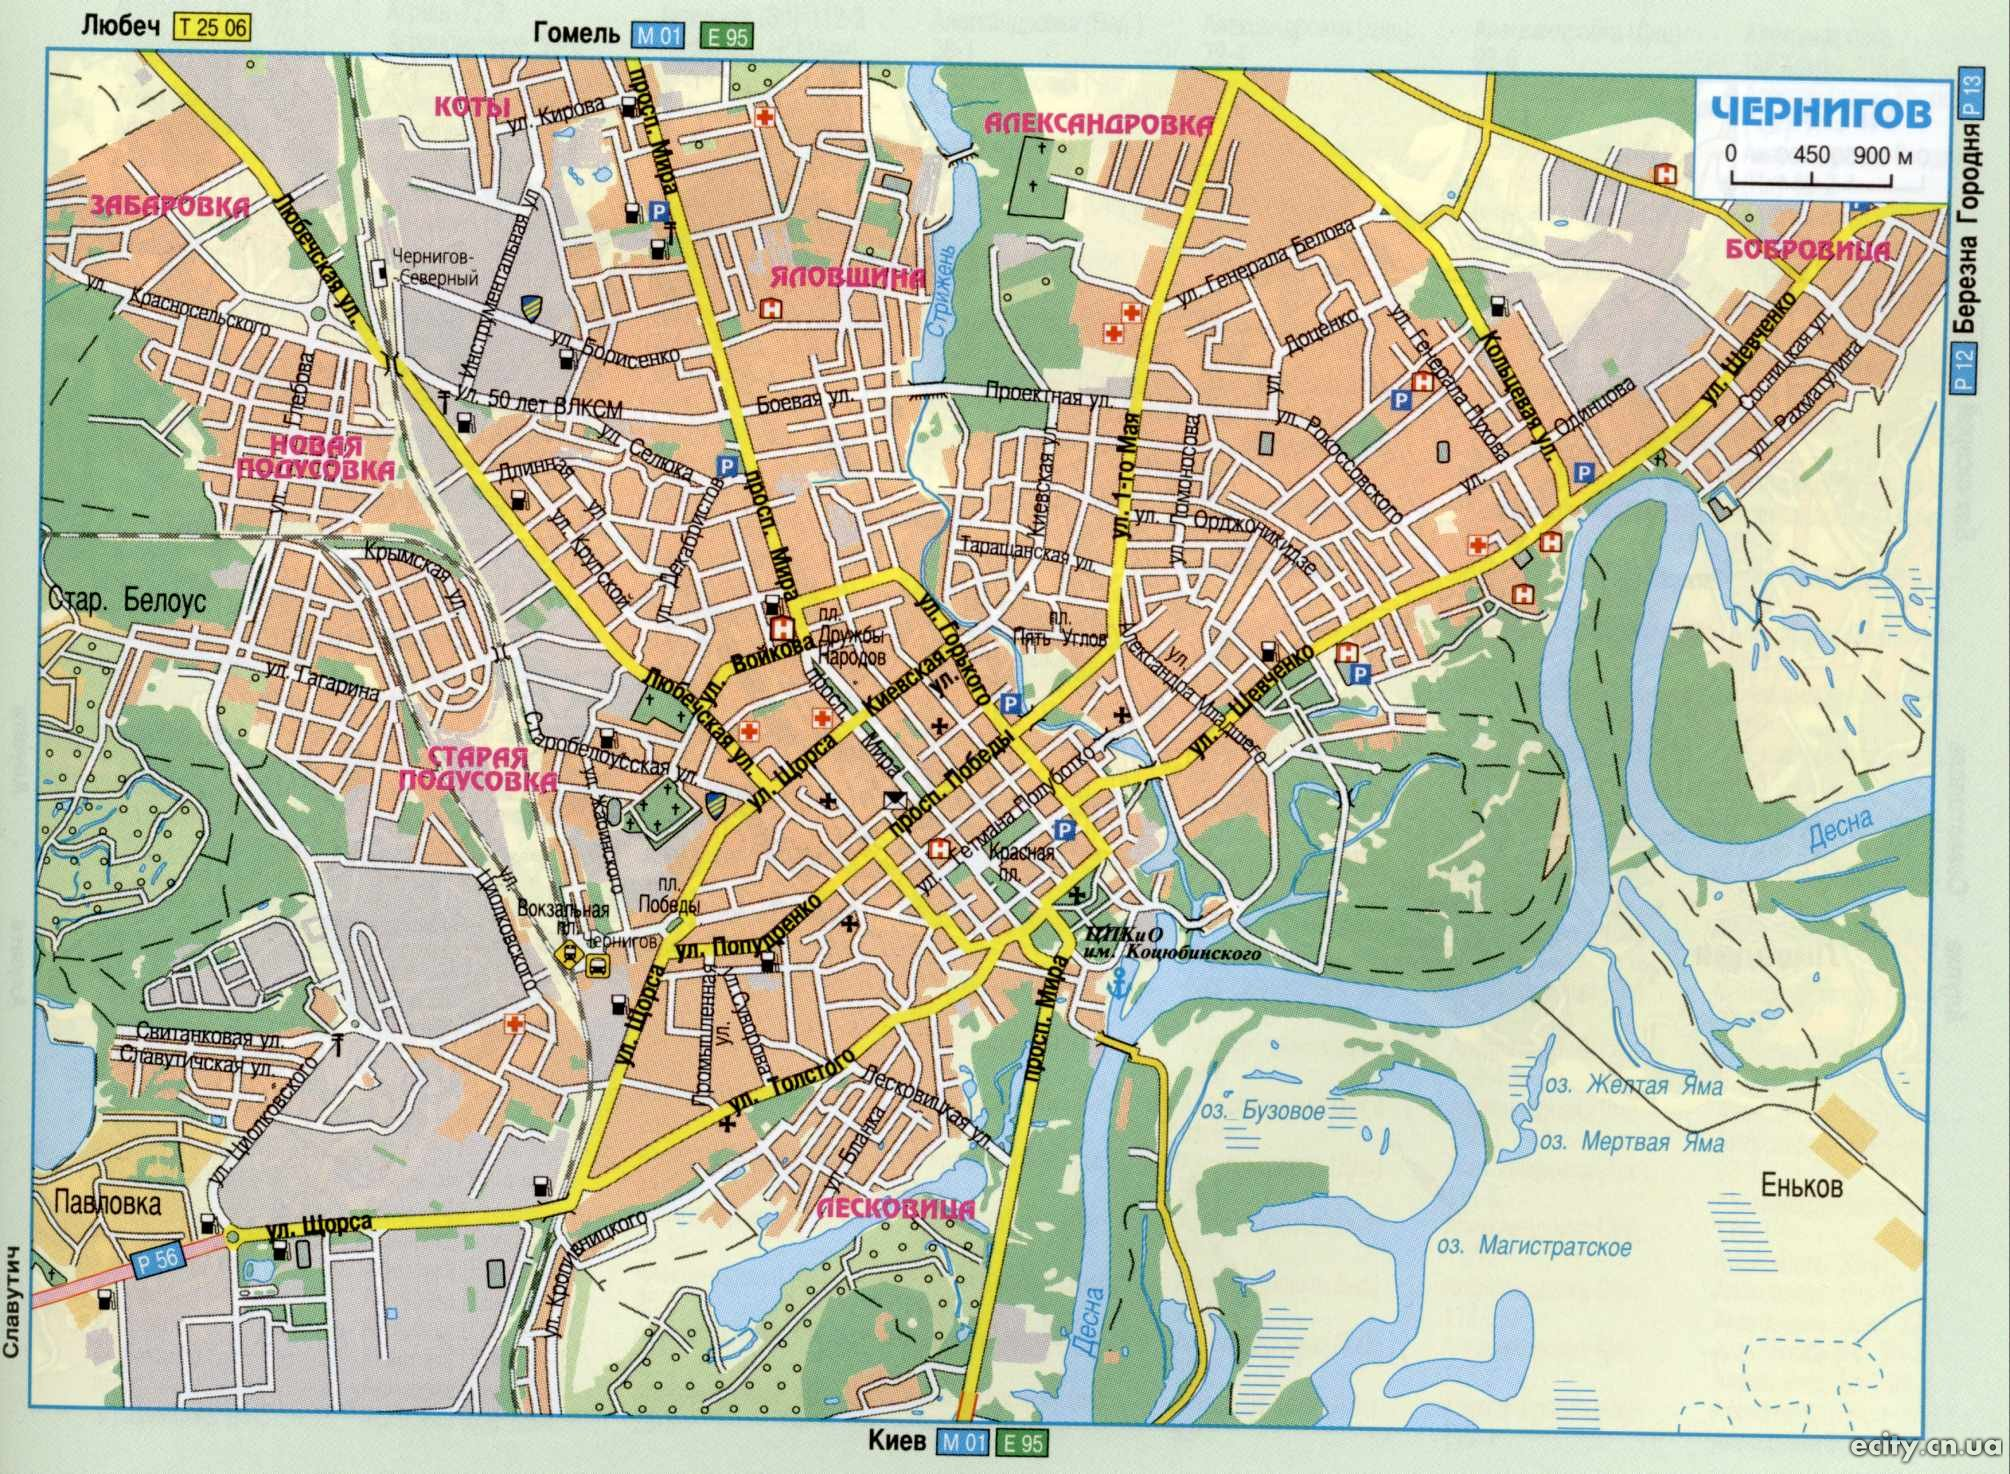 КАРТЫ ЧЕРНИГОВА И ЧЕРНИГОВСКОЙ ОБЛАСТИ: http://ecity.cn.ua/maps/22-raznye-karty-goroda-chernigova.html